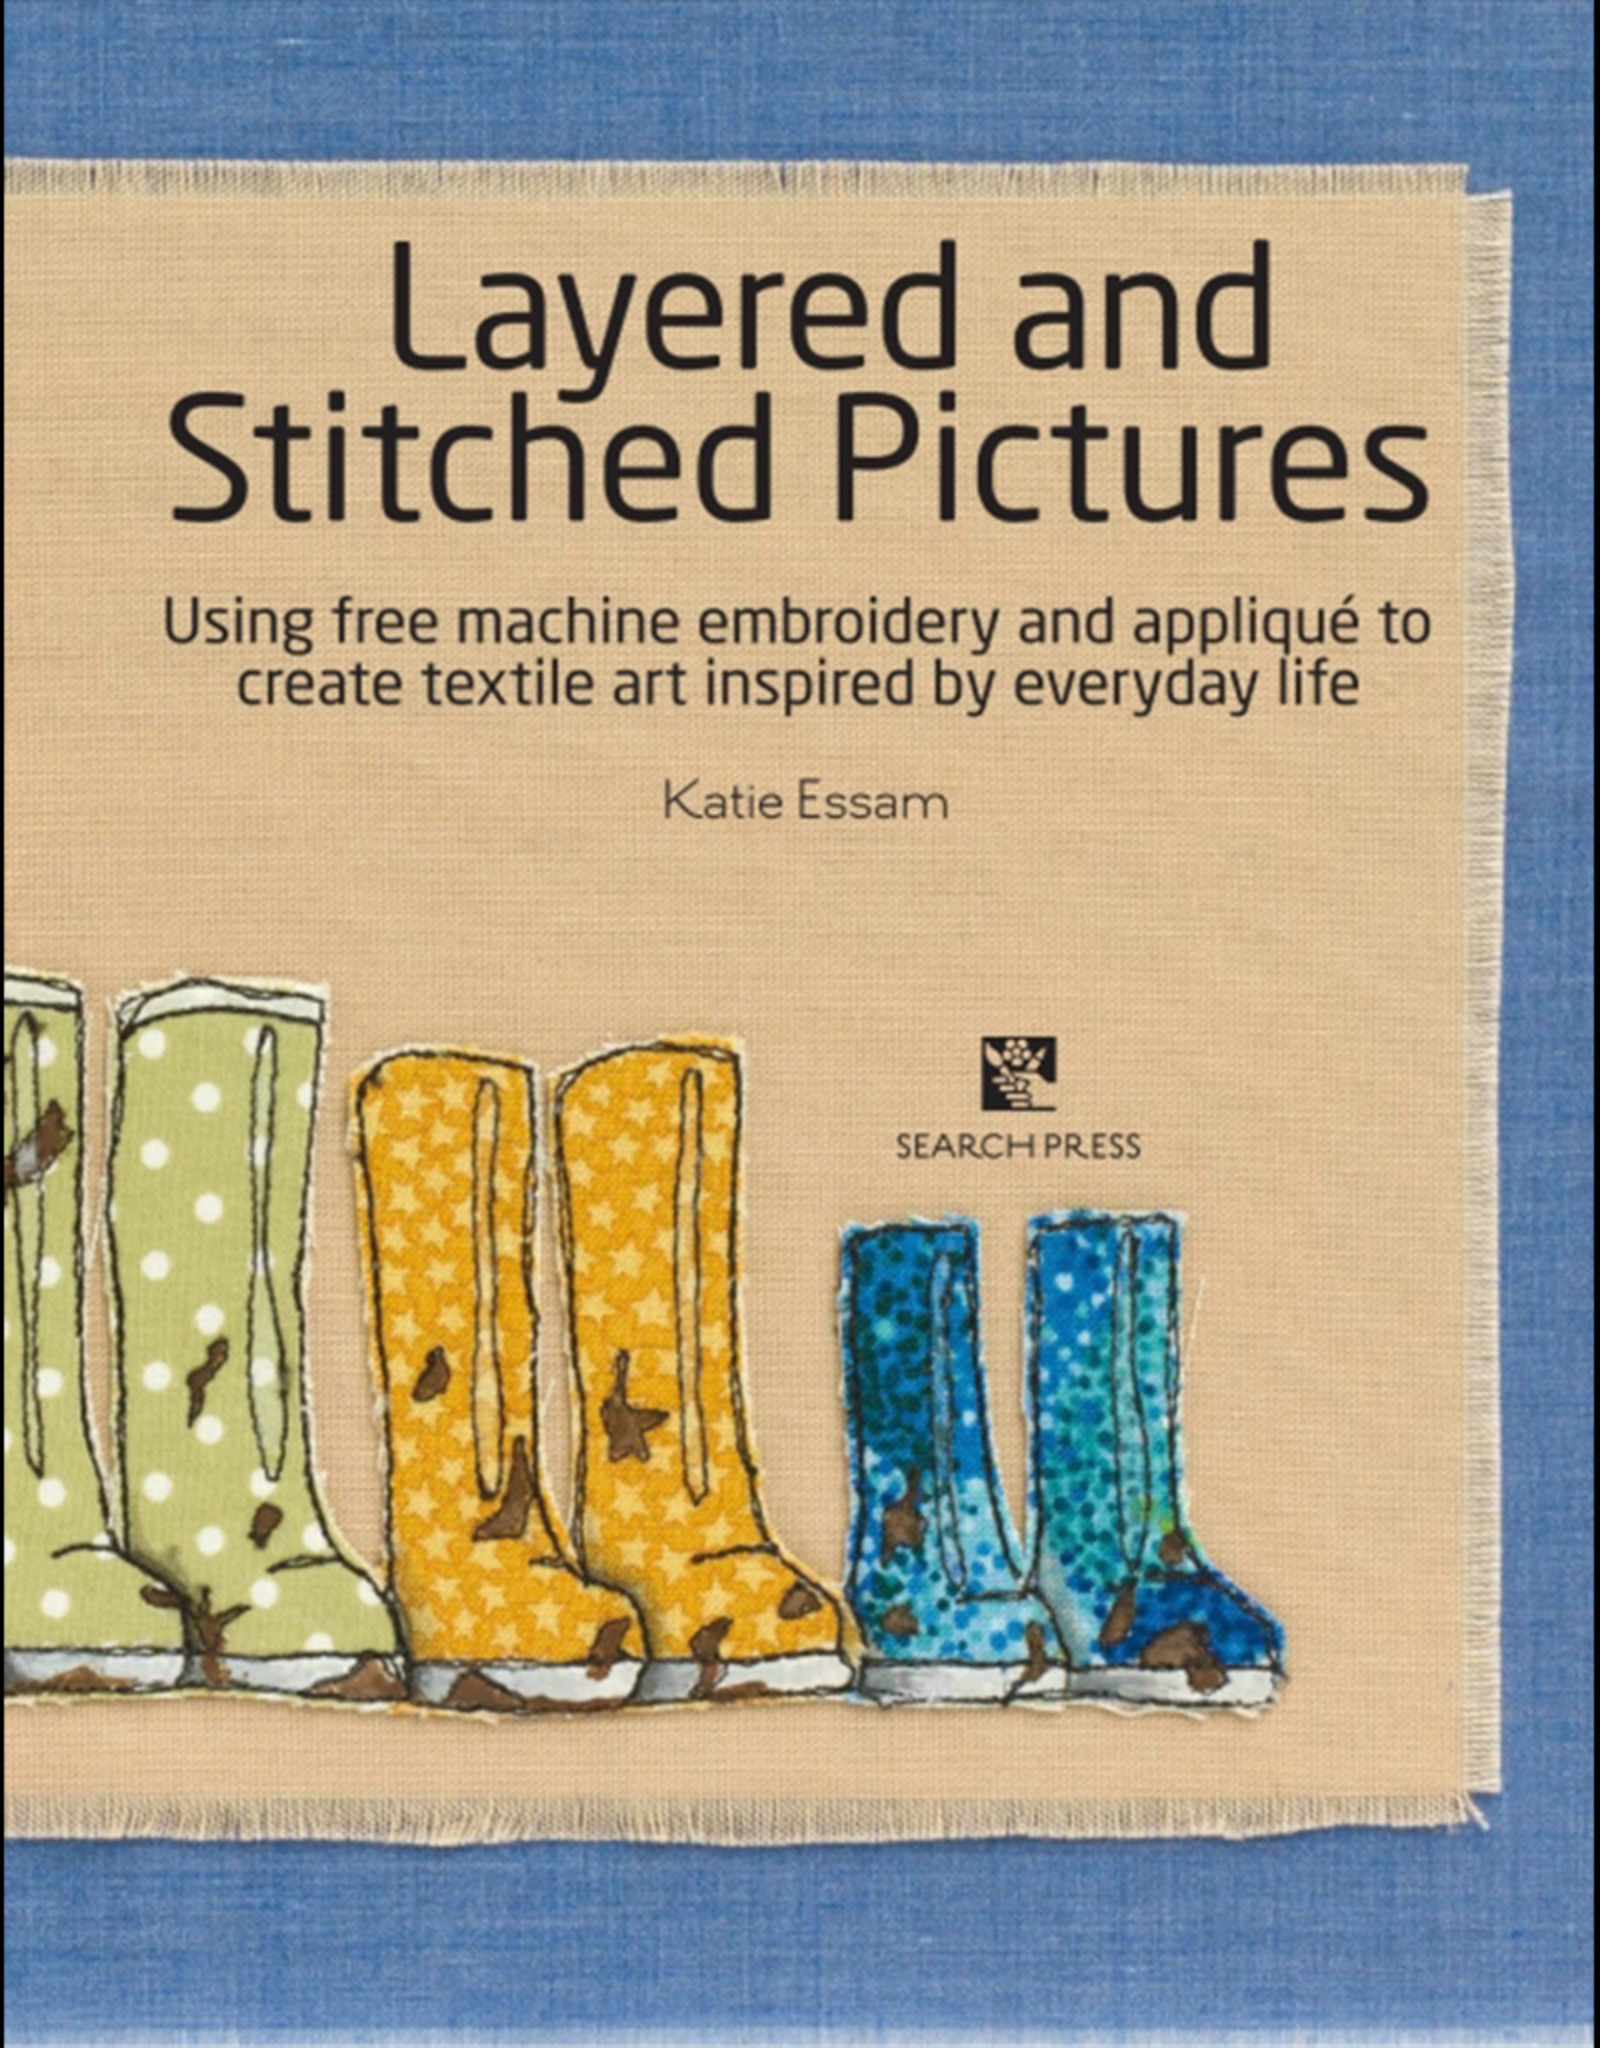 Layered Stitched Pictures / Katie Essam